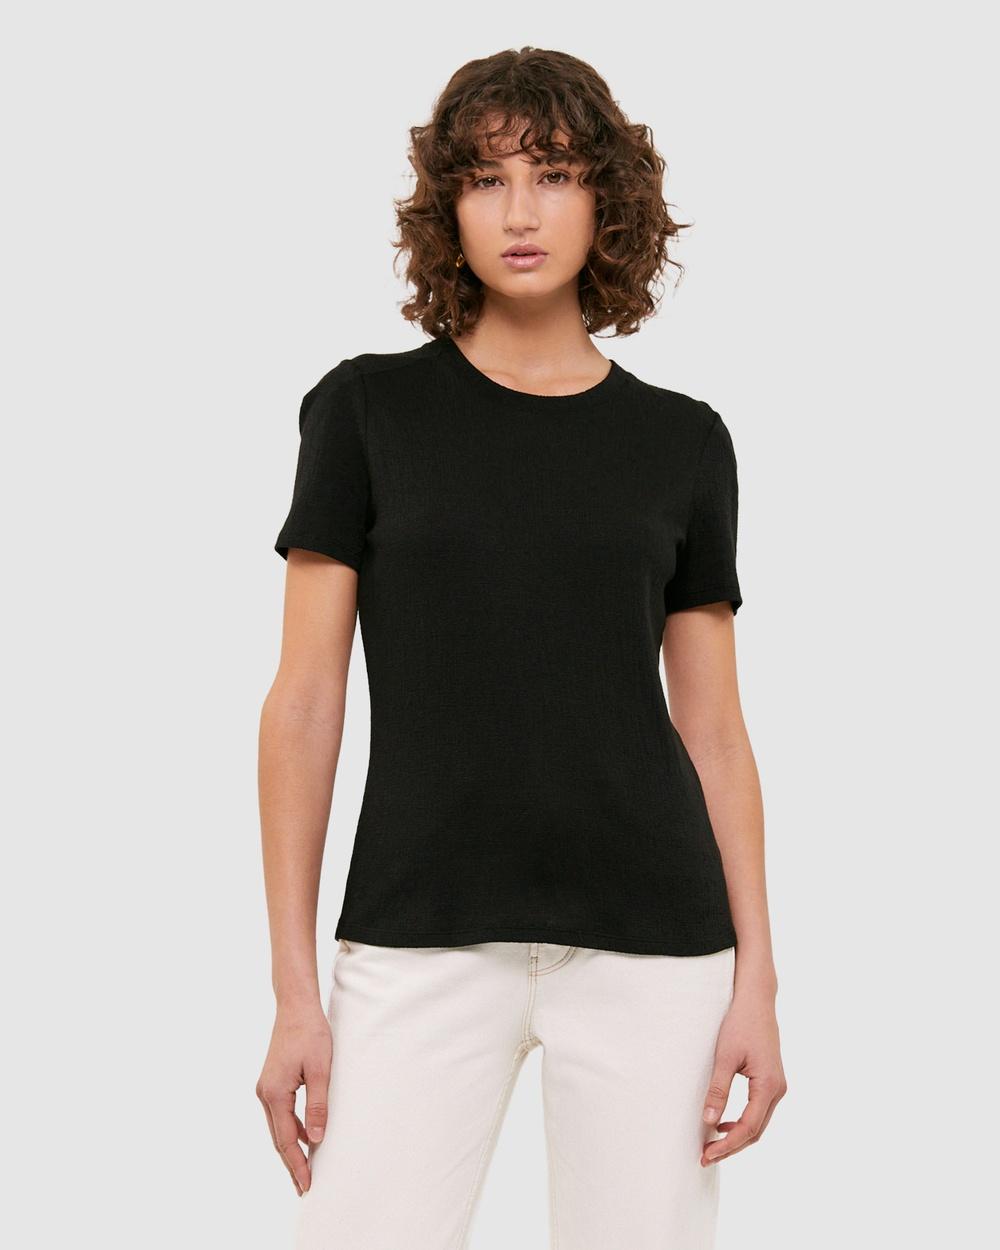 SABA Lucille Textured Tee T-Shirts & Singlets Black Australia